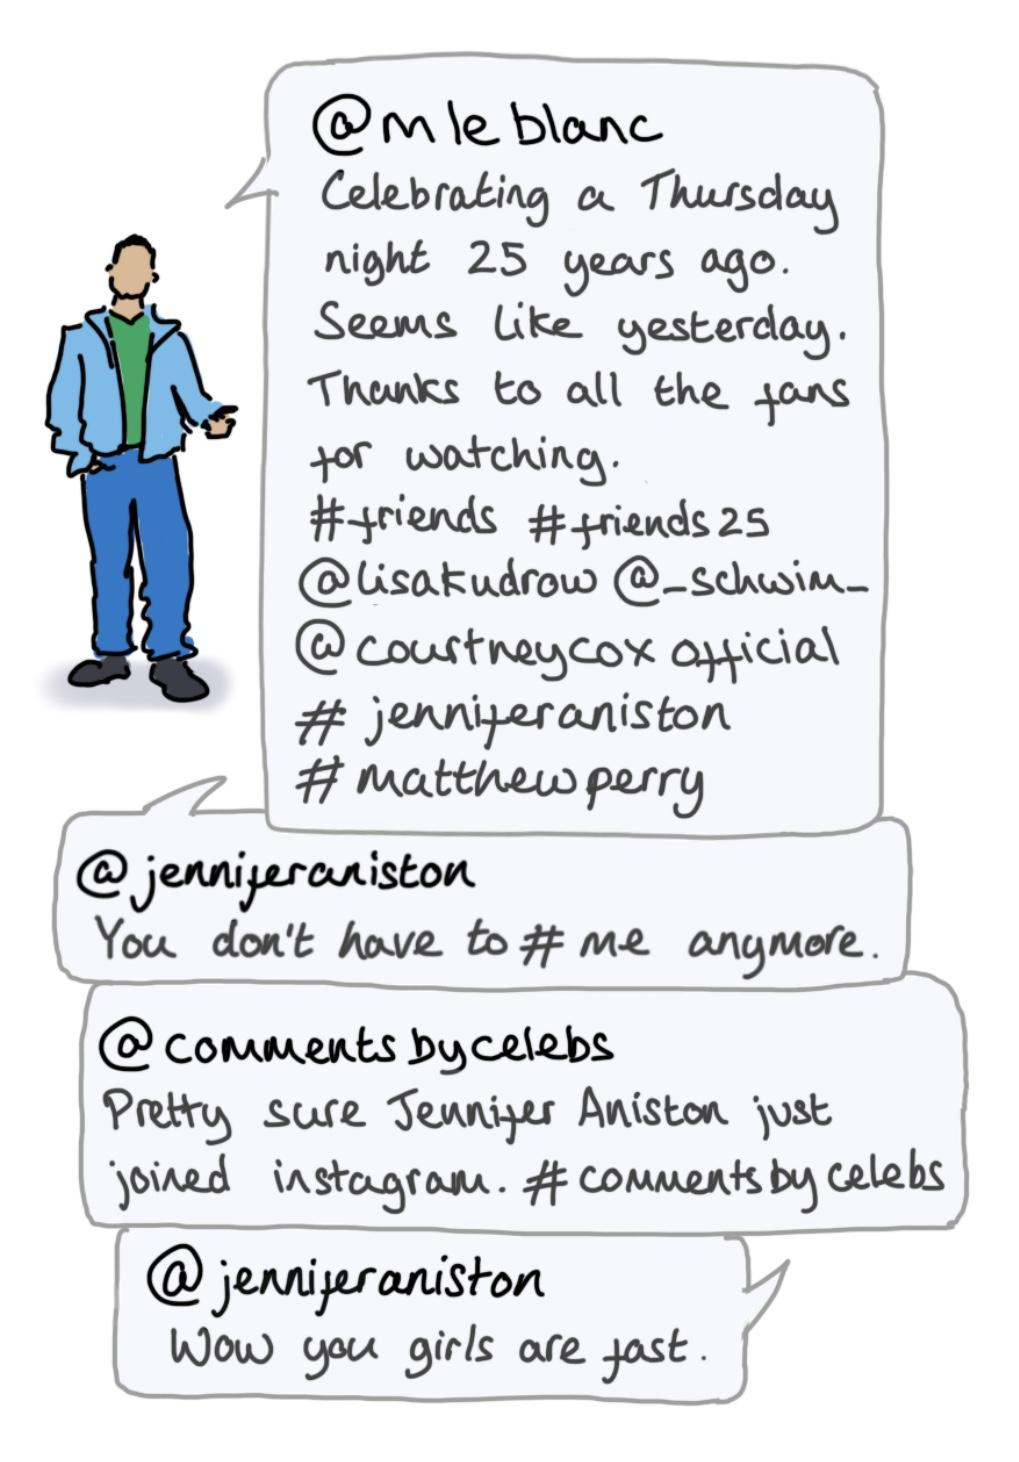 Cartoon illustration of Matt LeBlanc with text from LeBlanc's Instagram account.